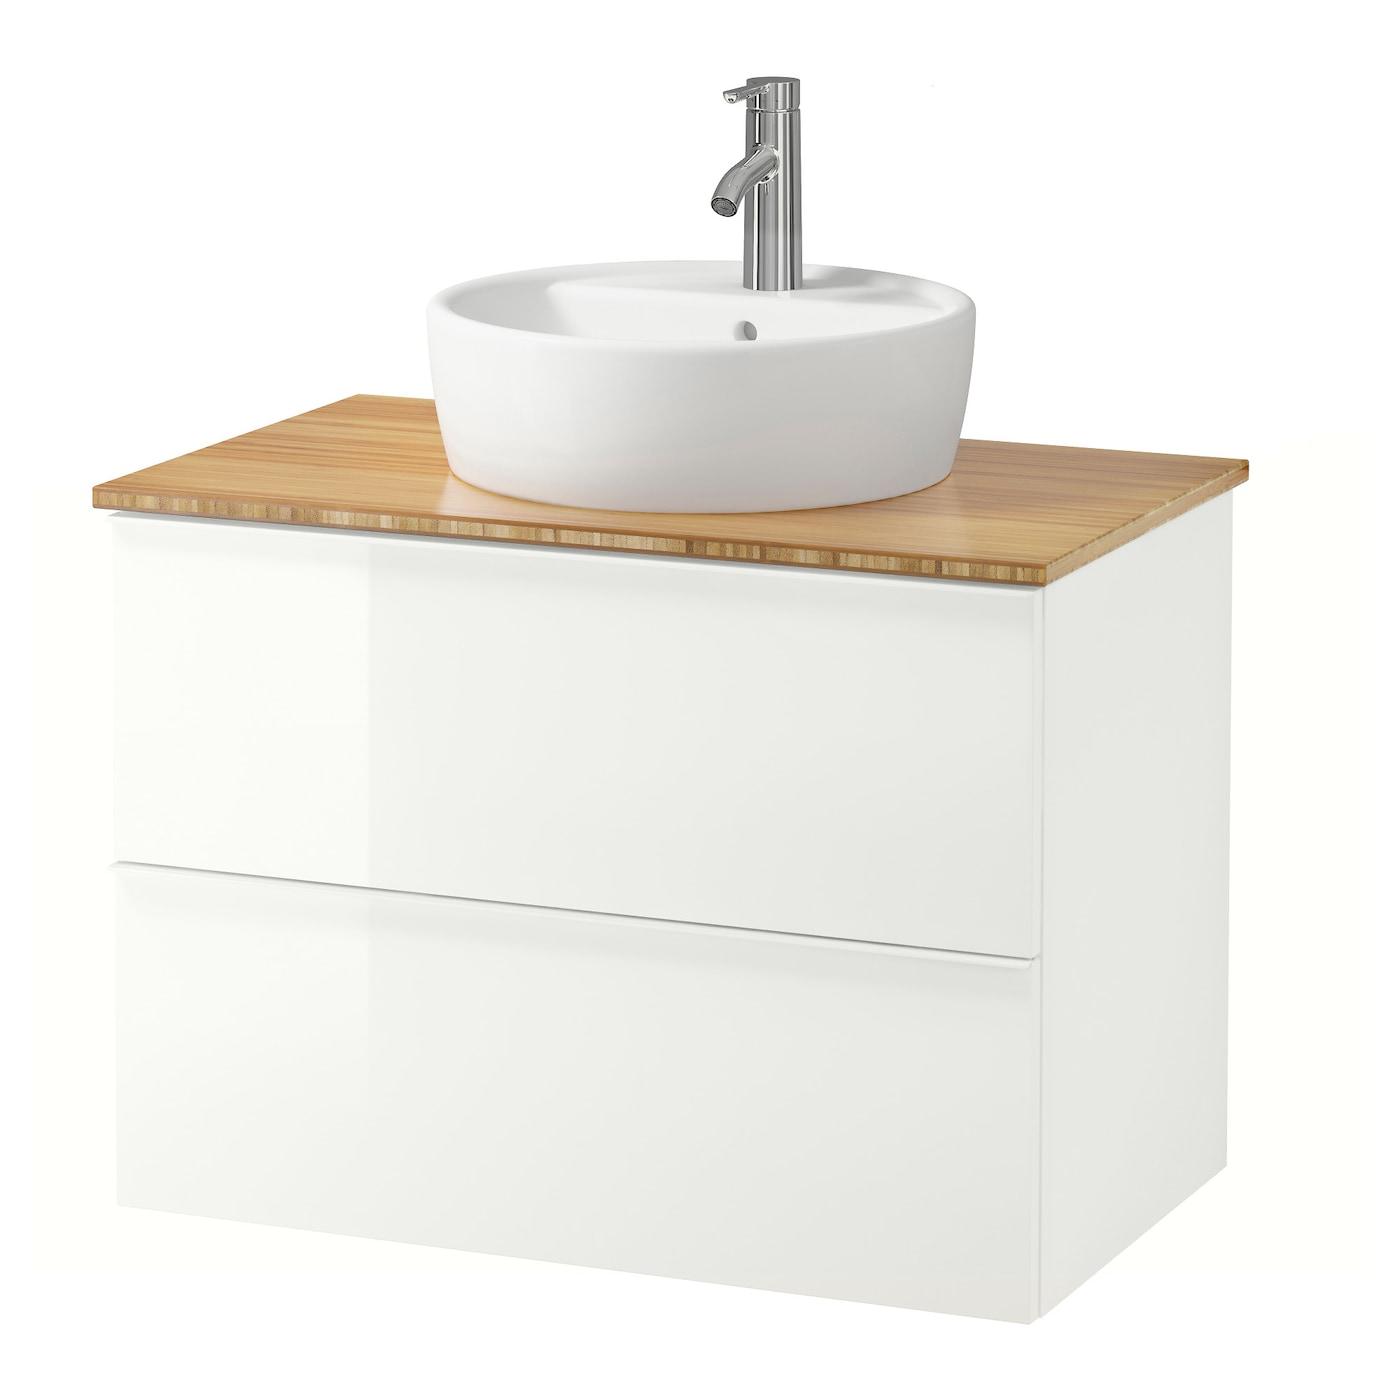 godmorgon tolken t rnviken wsh stnd w countertop 45 wsh. Black Bedroom Furniture Sets. Home Design Ideas